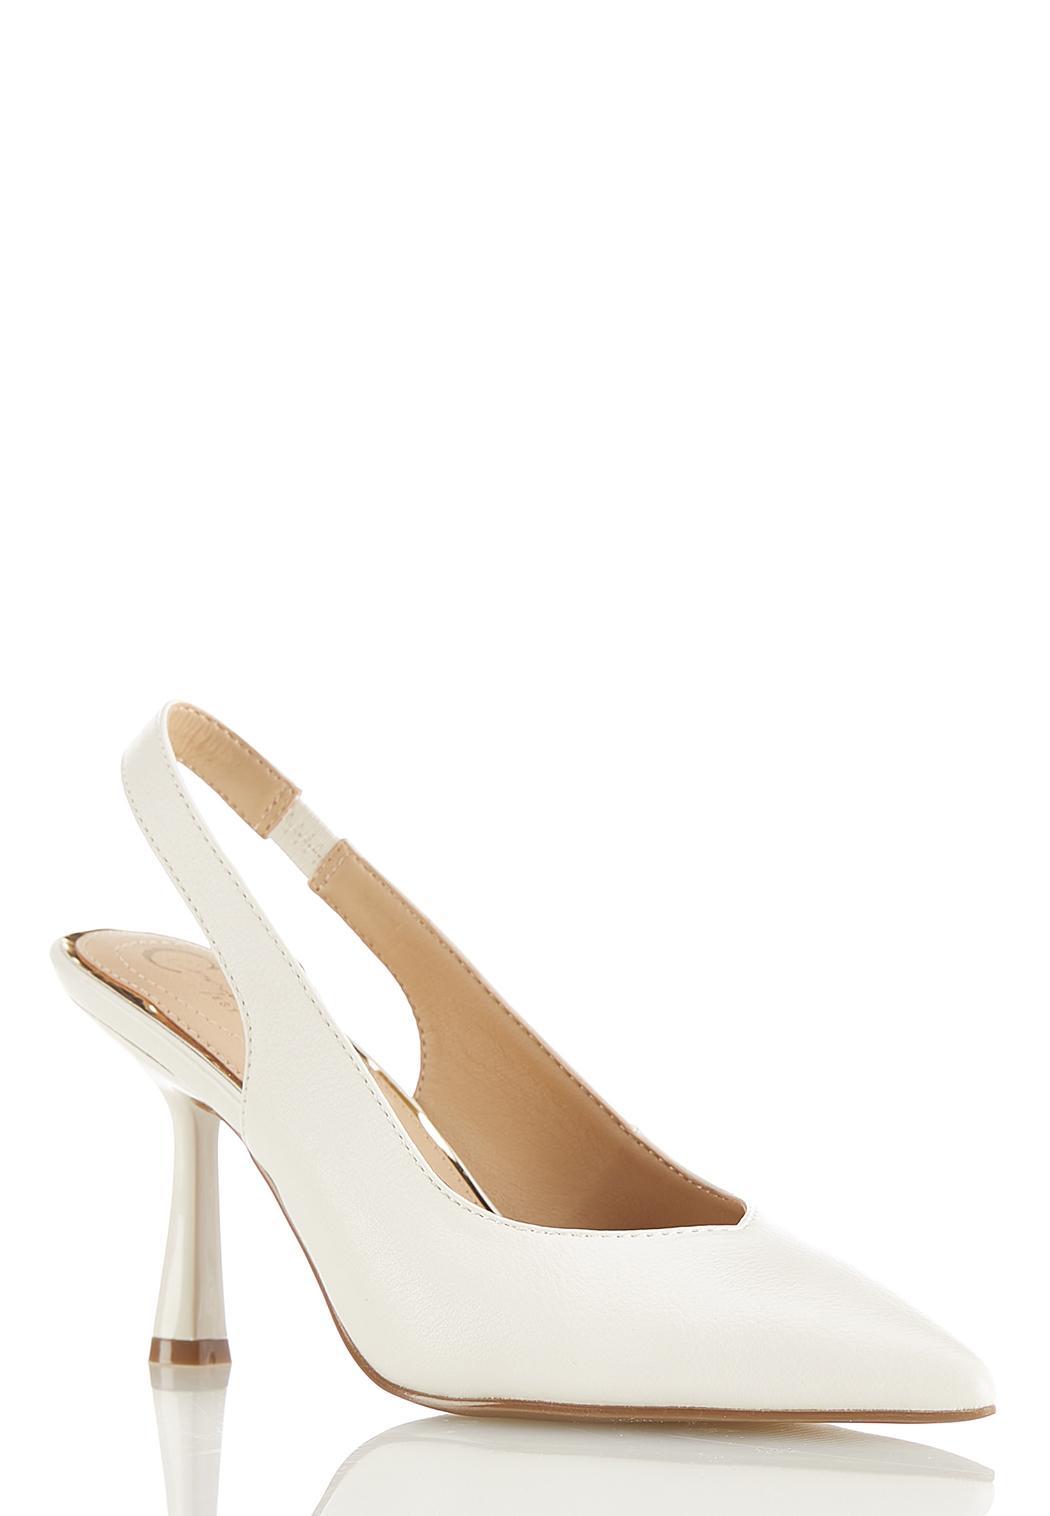 Fashion Heel Ivory Pumps